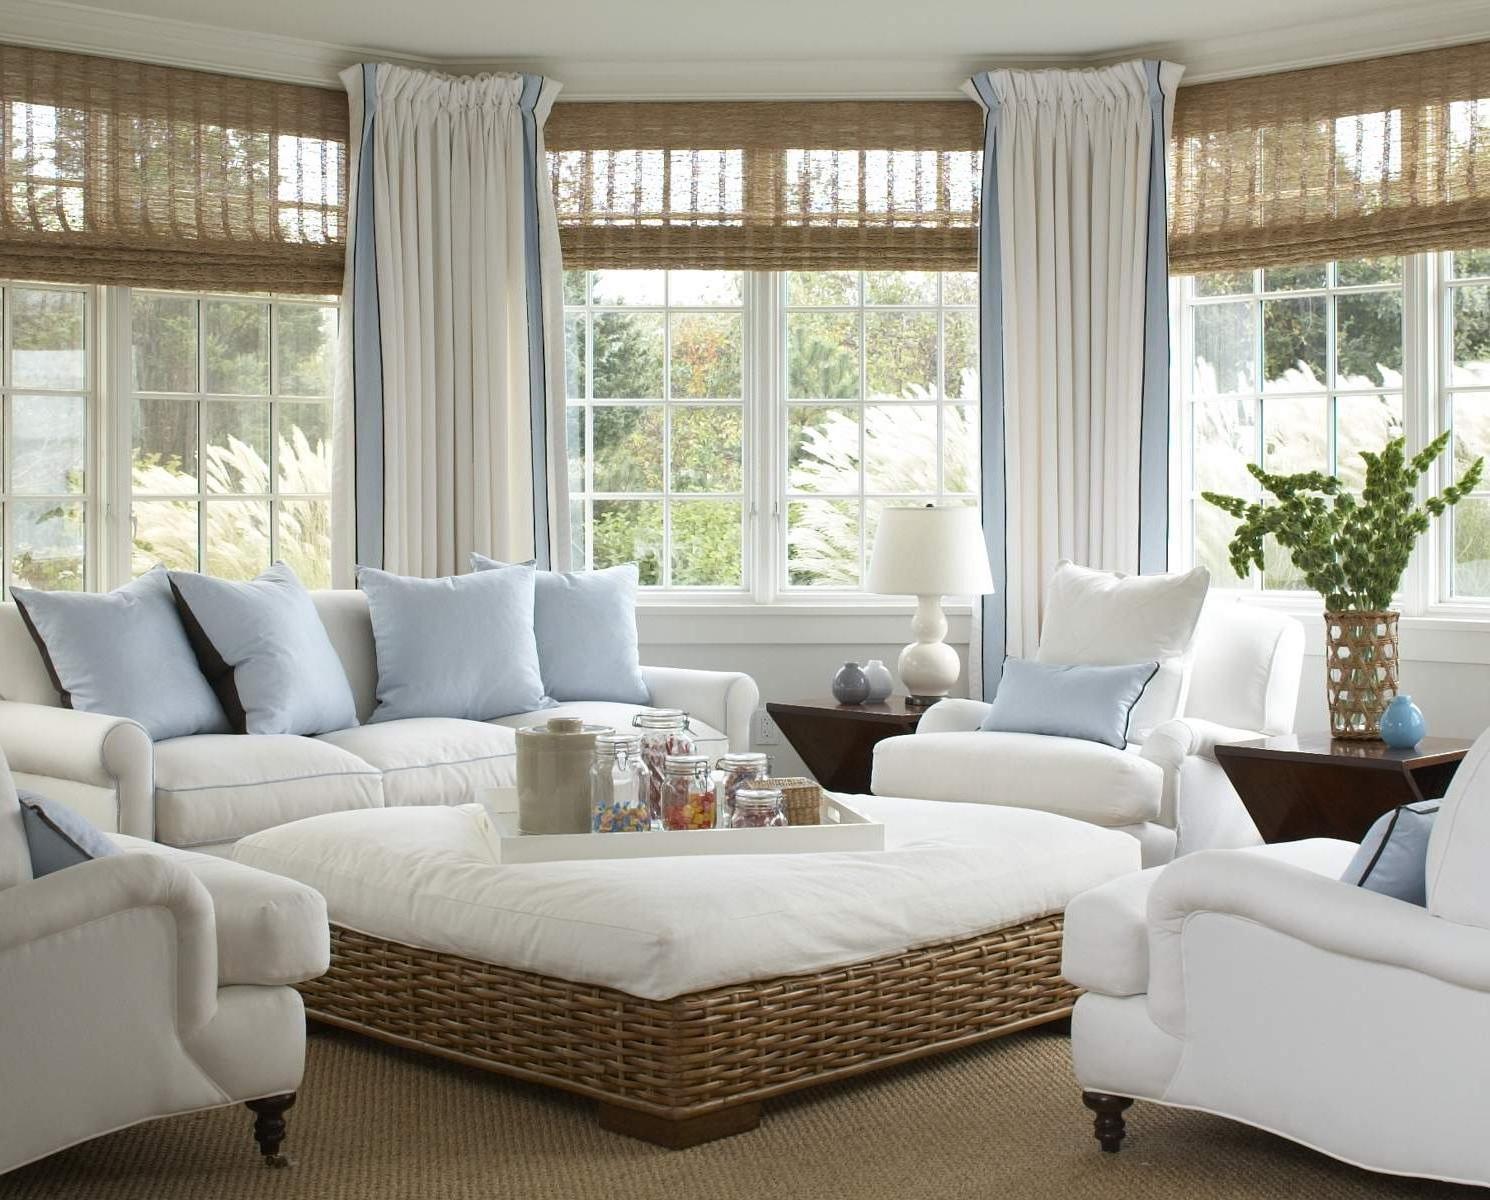 Бело-голубые шторы